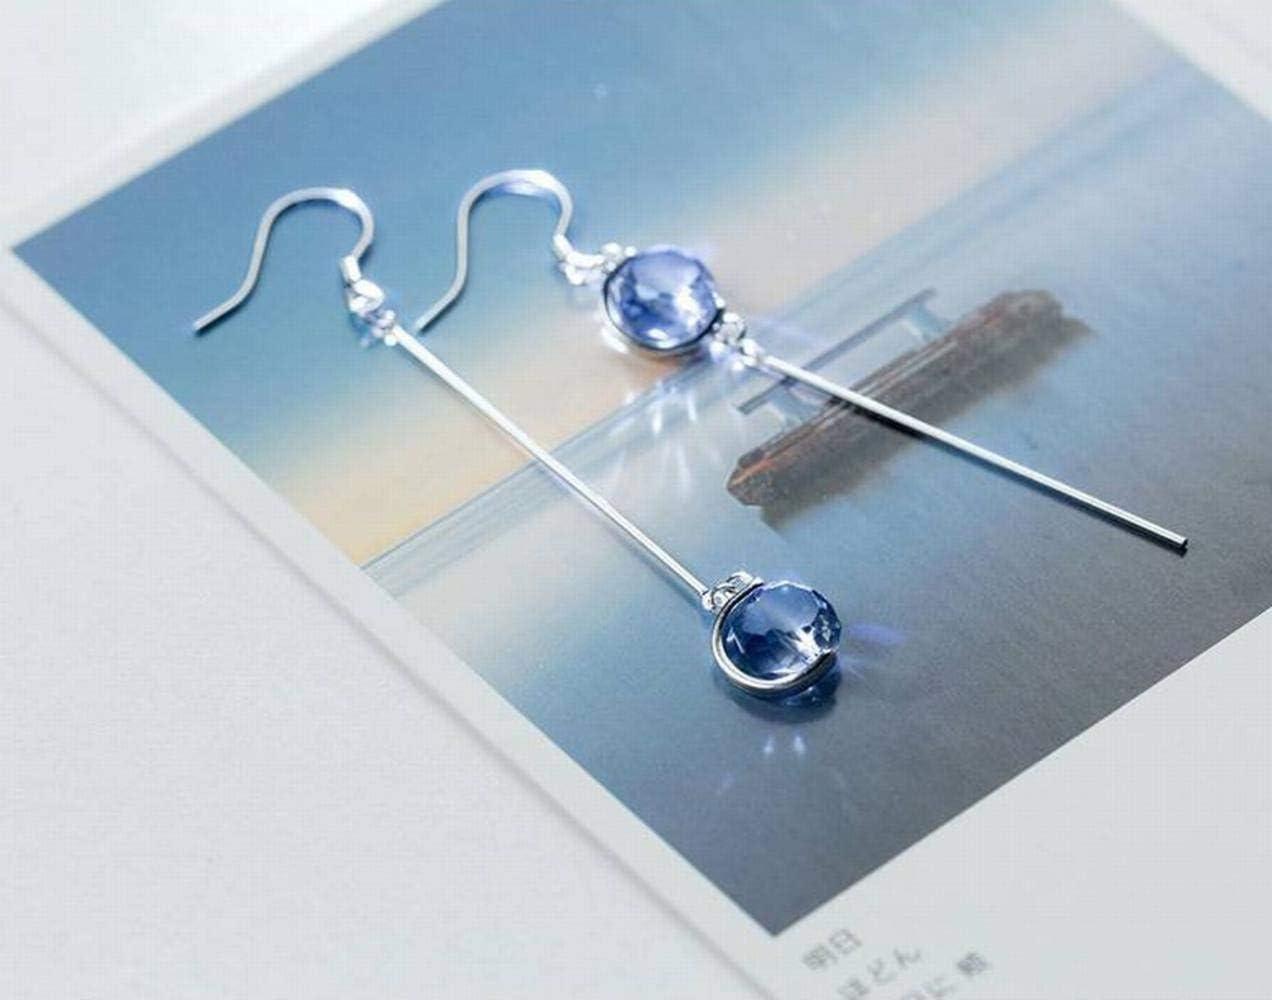 O&YQ S925 Pendientes de Plata Dulce de Mujer Sintético Azucarada Roca Cristal Azul Asimétrico Oreja Larga Joyería Femenina, Plata 925 d